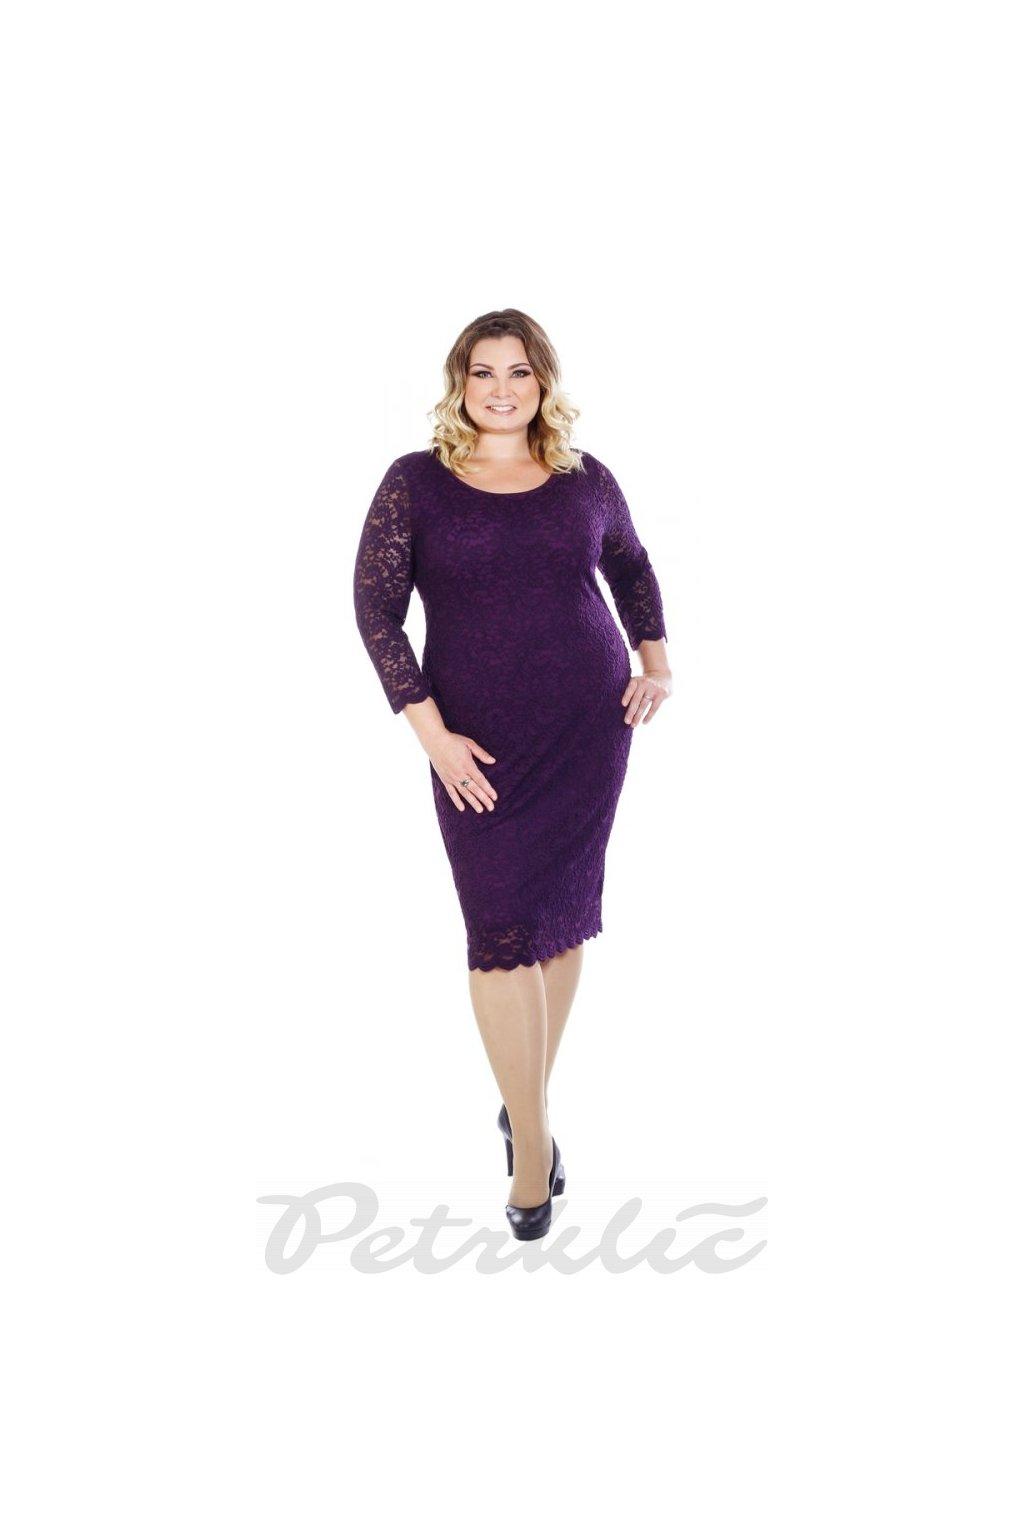 TAMARA - šaty dlouhý rukáv 100 - 105 cm